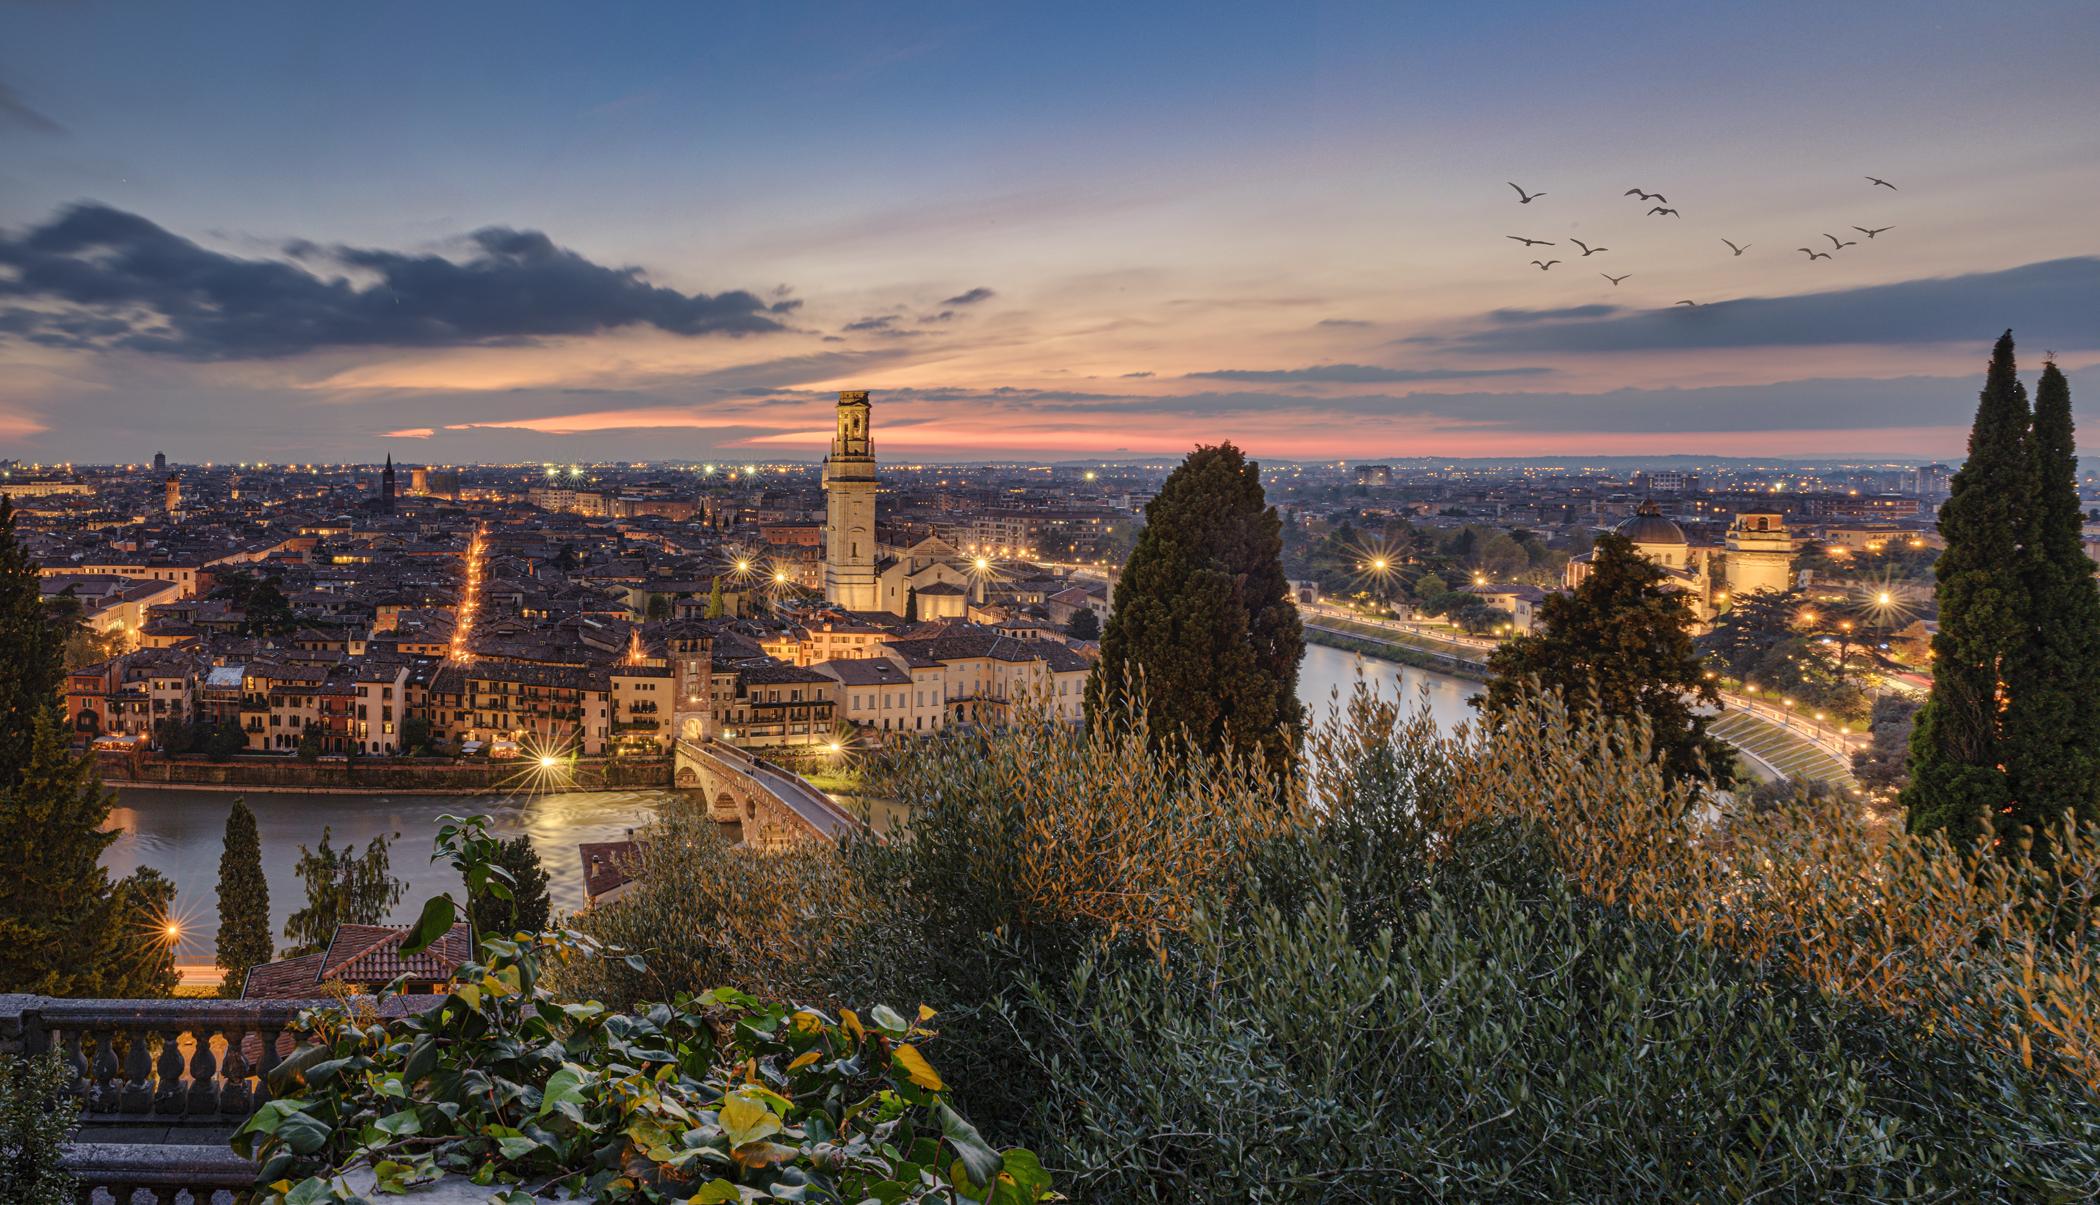 Verona panorama 1 - Verona (VR)